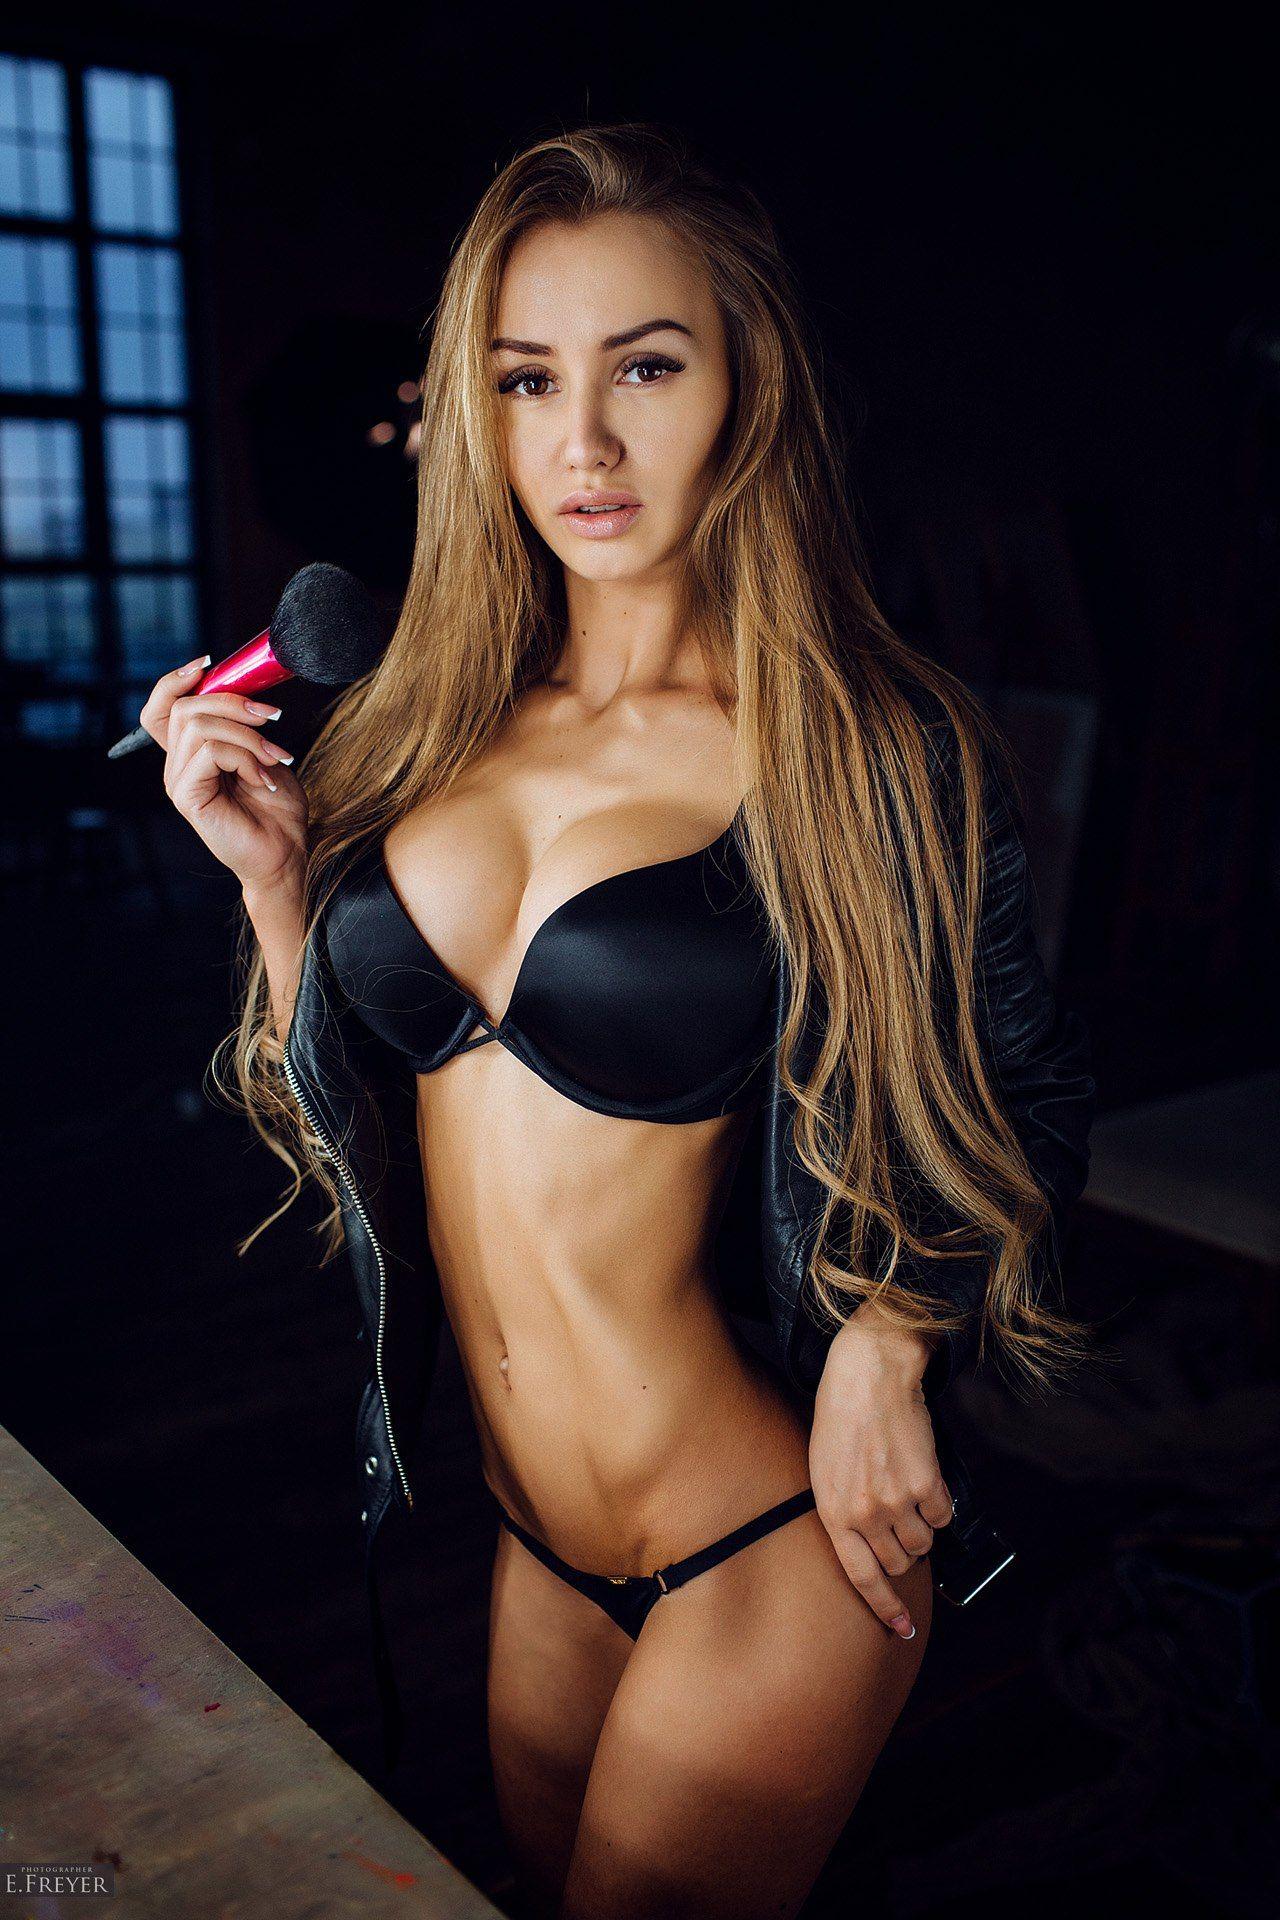 Hot Valentina Belleza naked (85 photos), Pussy, Hot, Selfie, underwear 2015